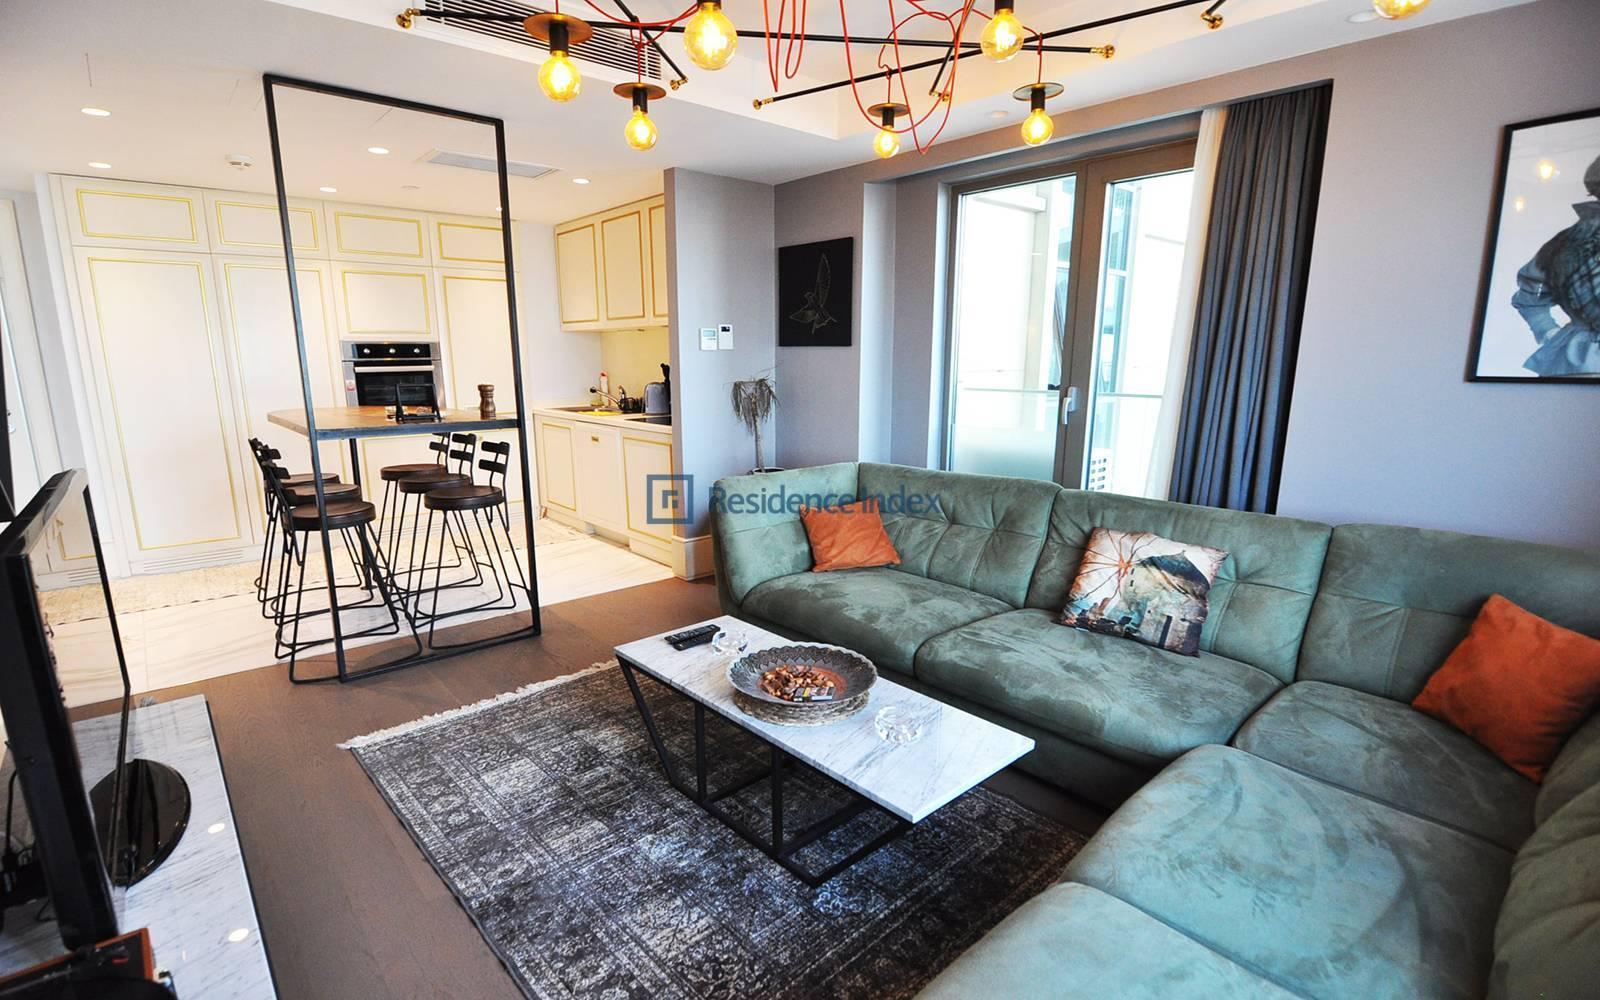 Elysium Art Bomonti - 1+1 Flat for Sale with Perfect Bosphorus View